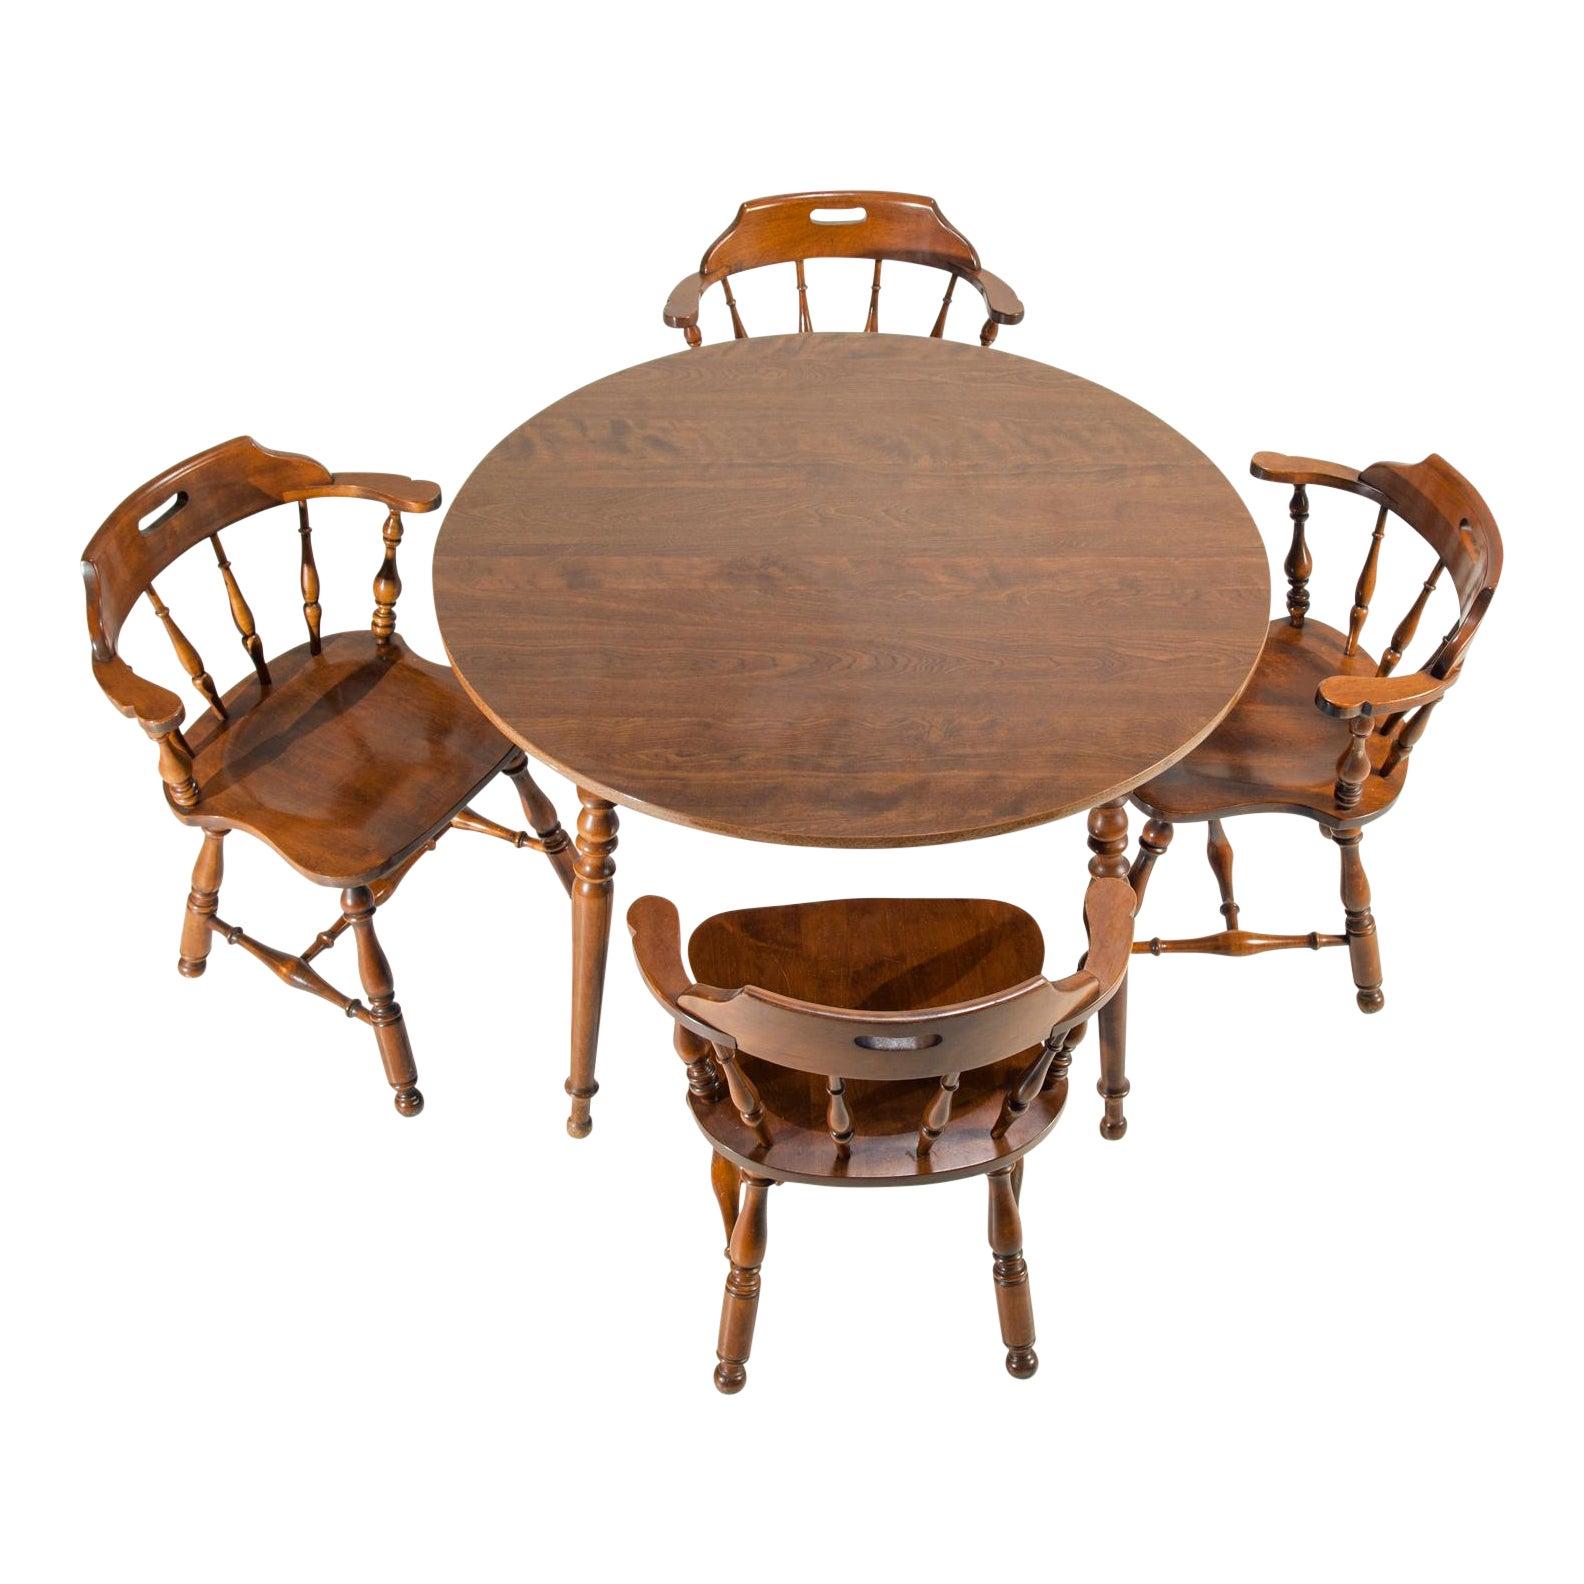 Ethan Allen Heirloom Nutmeg Maple Dining Table & Chairs